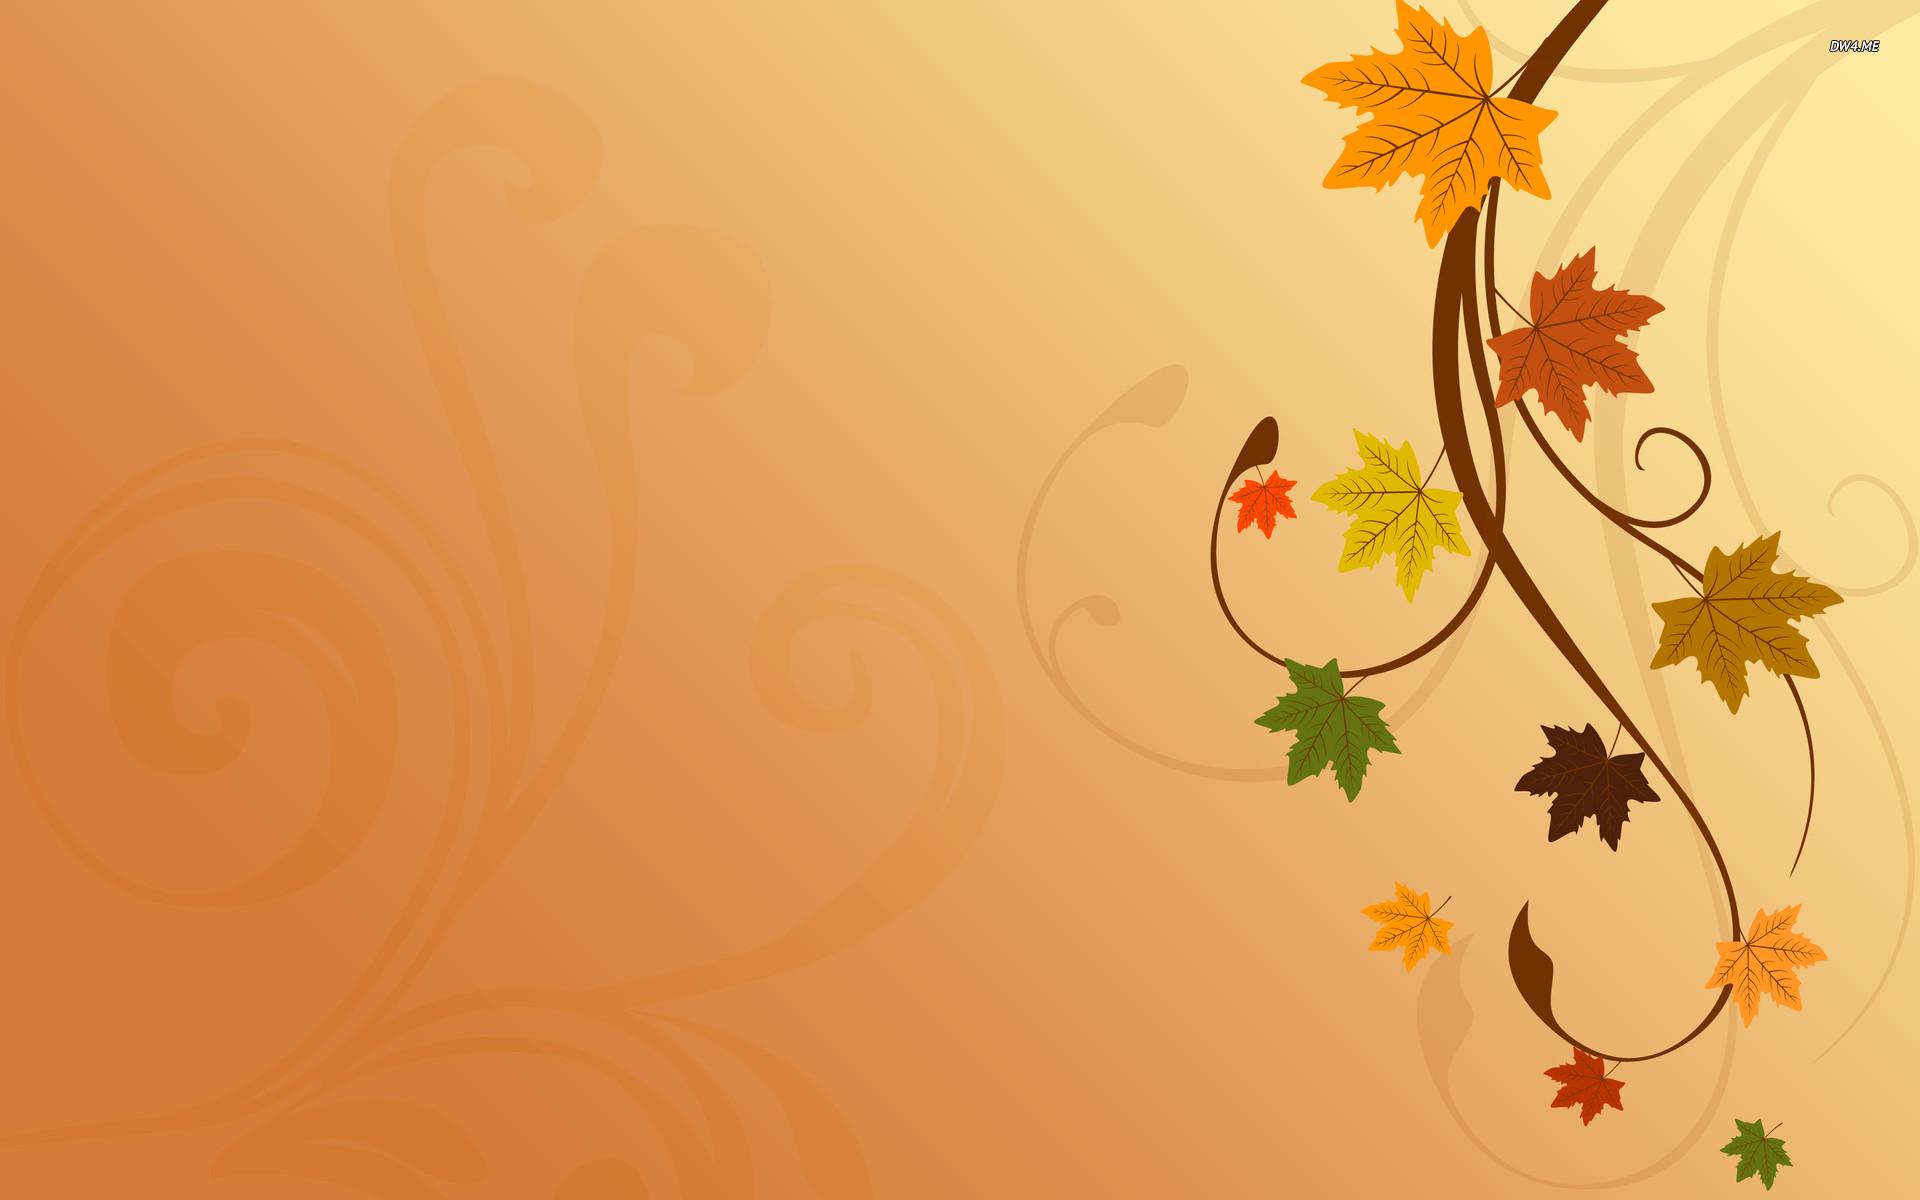 Thanksgiving Desktop Wallpapers Backgrounds 58 images 1920x1200